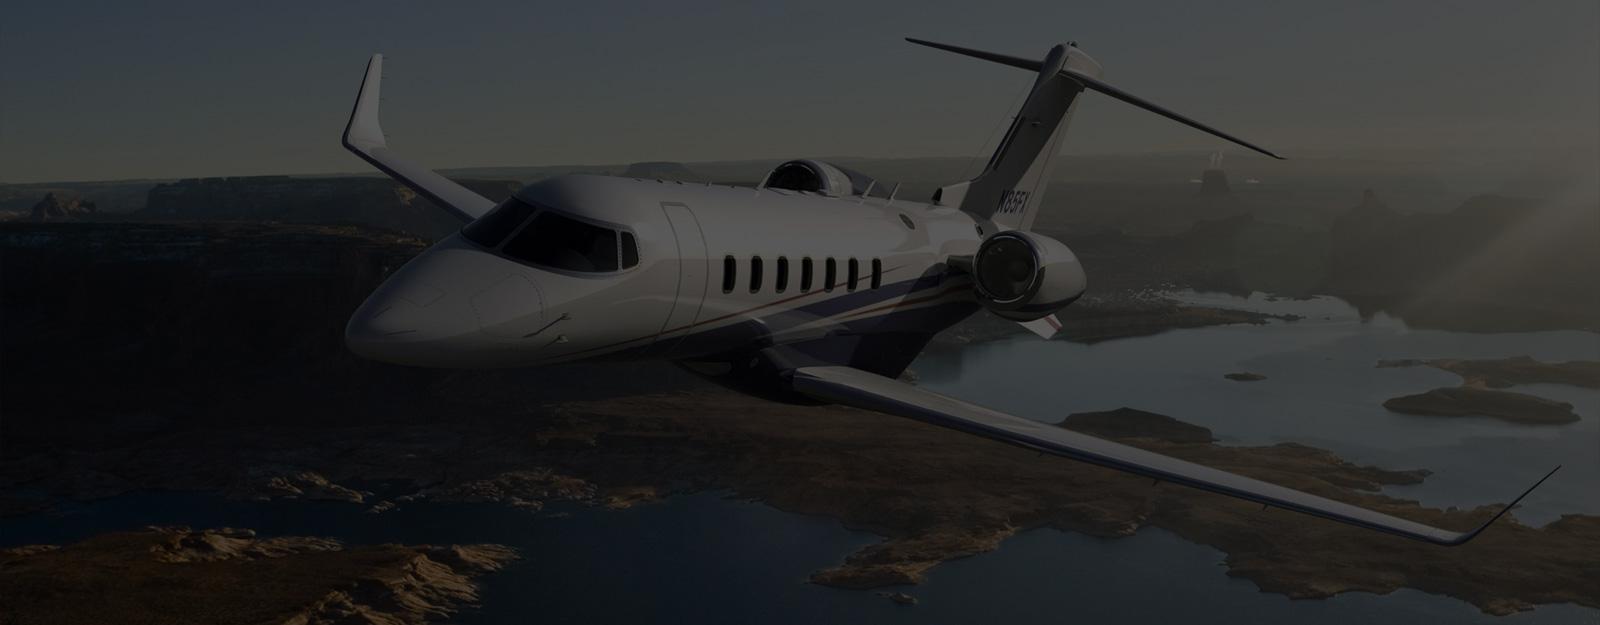 White private jet in flight